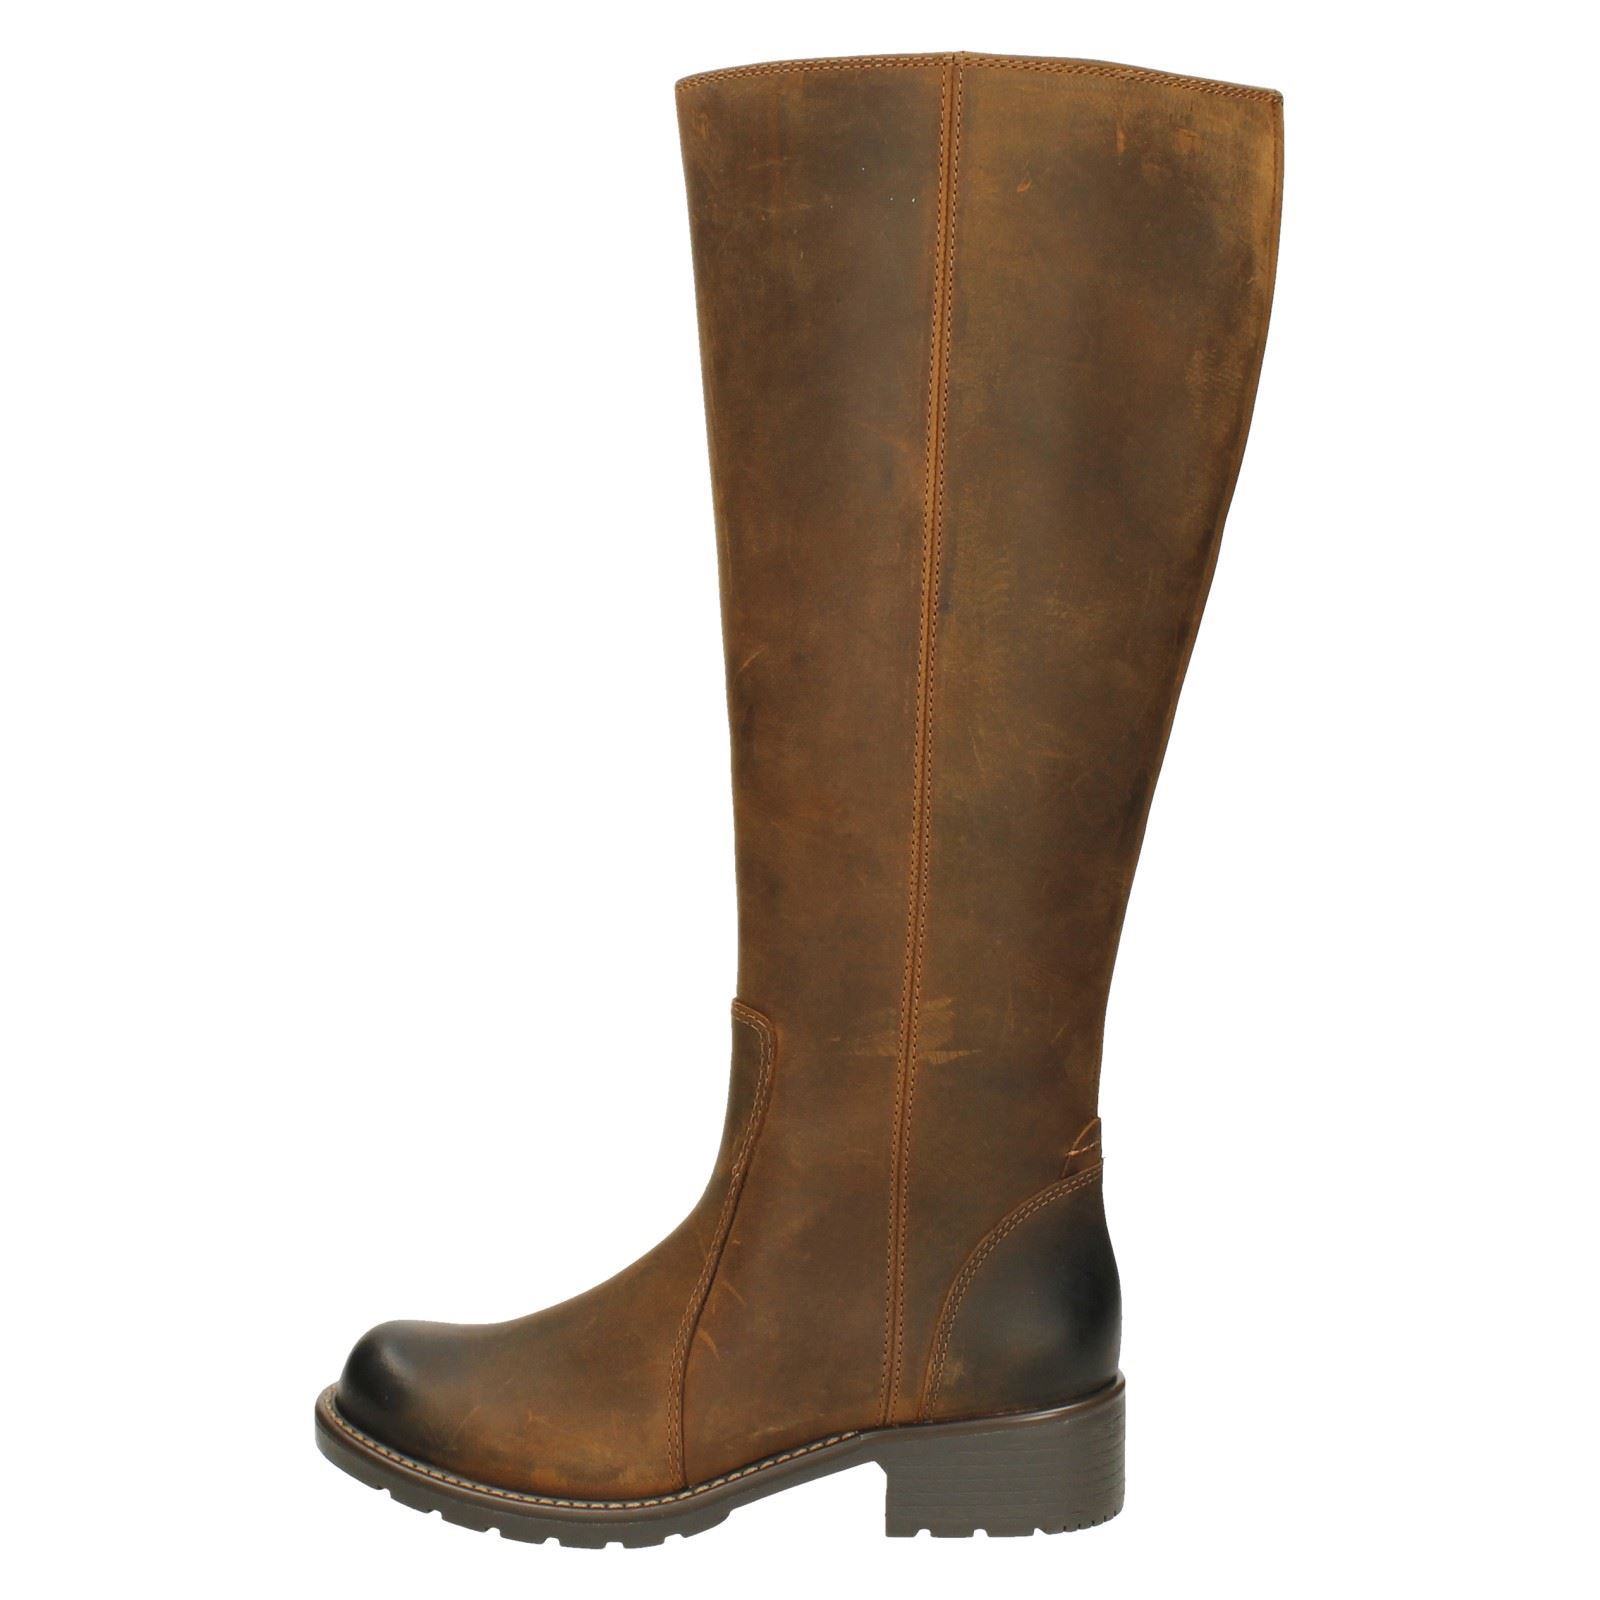 Eave Snuff al ginocchio Clarks marrone Brown Stivali Donna Orinoco wEHxXt0tq